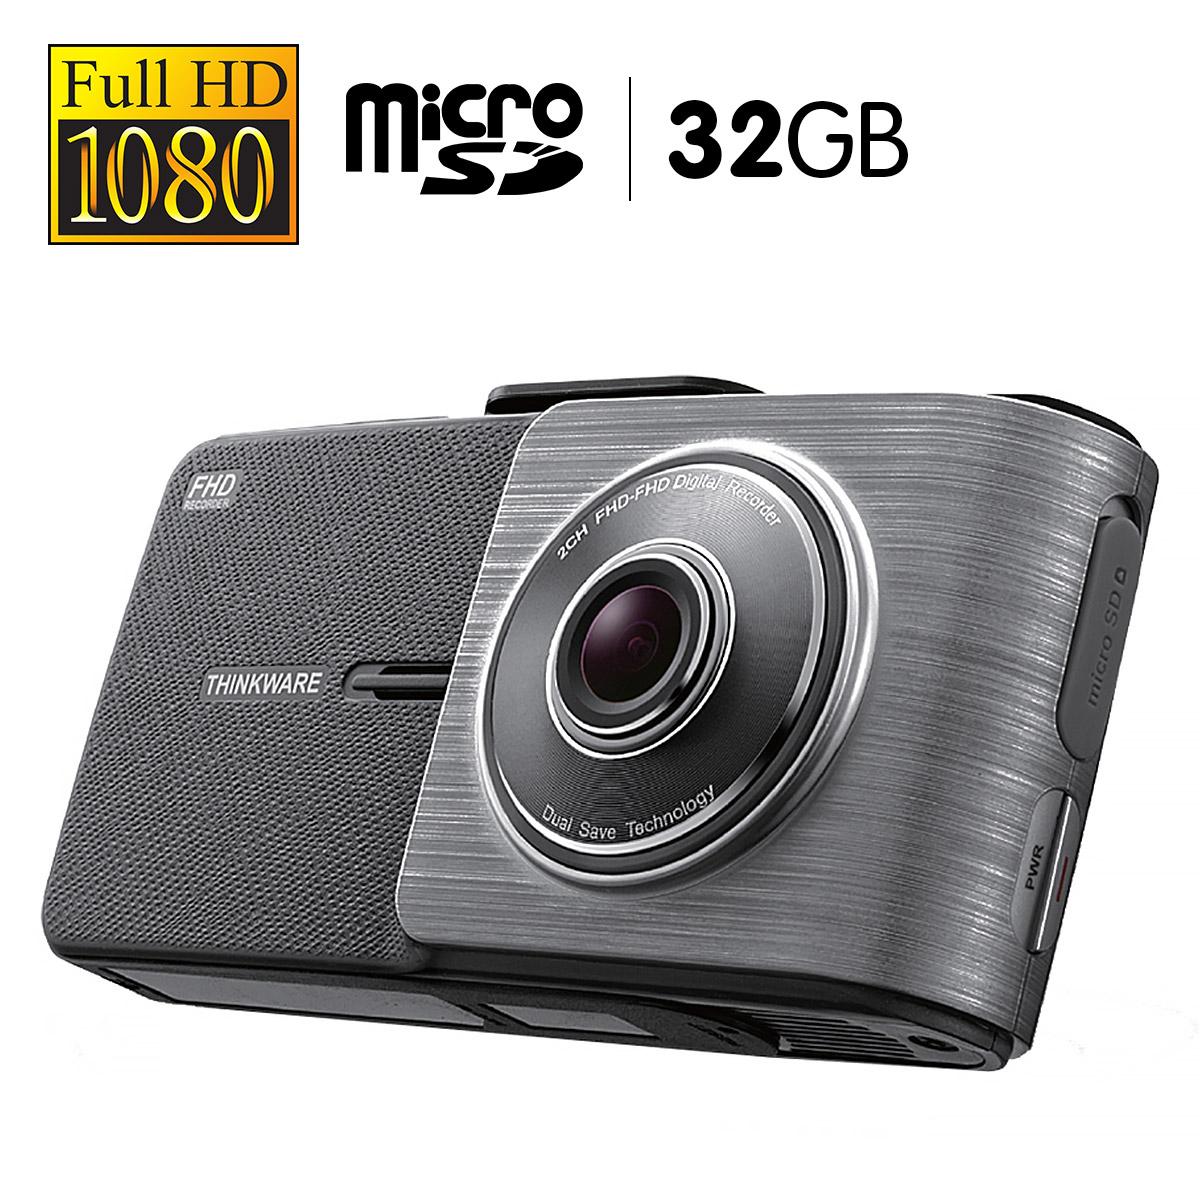 THINKWARE 1080P Full HD Dash Cam With 32GB Micro SD - X55032